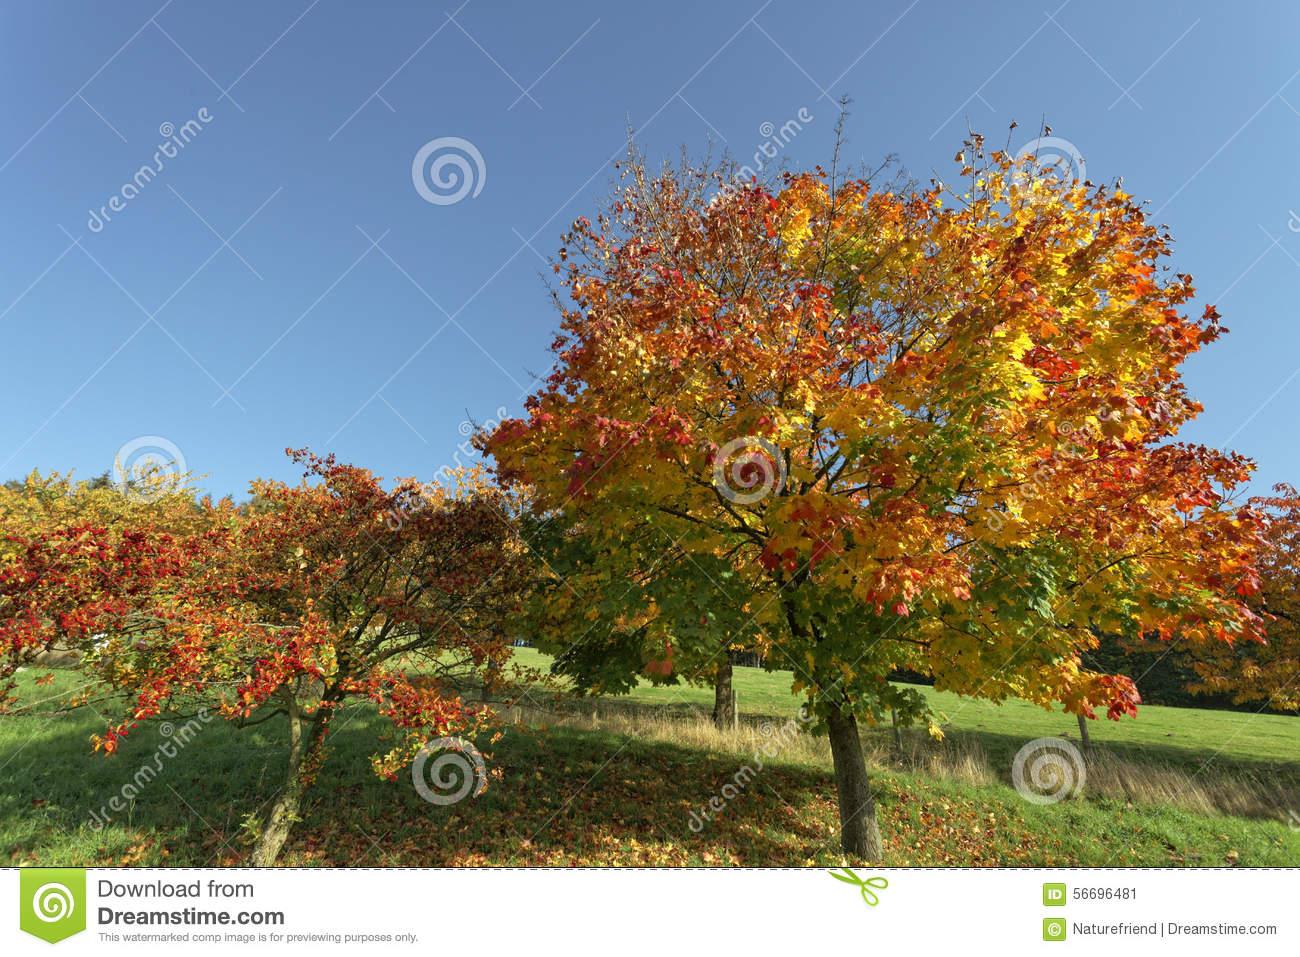 Acer Platanoides, Norway Maple In Autumn, Hagen, Lower Saxony.